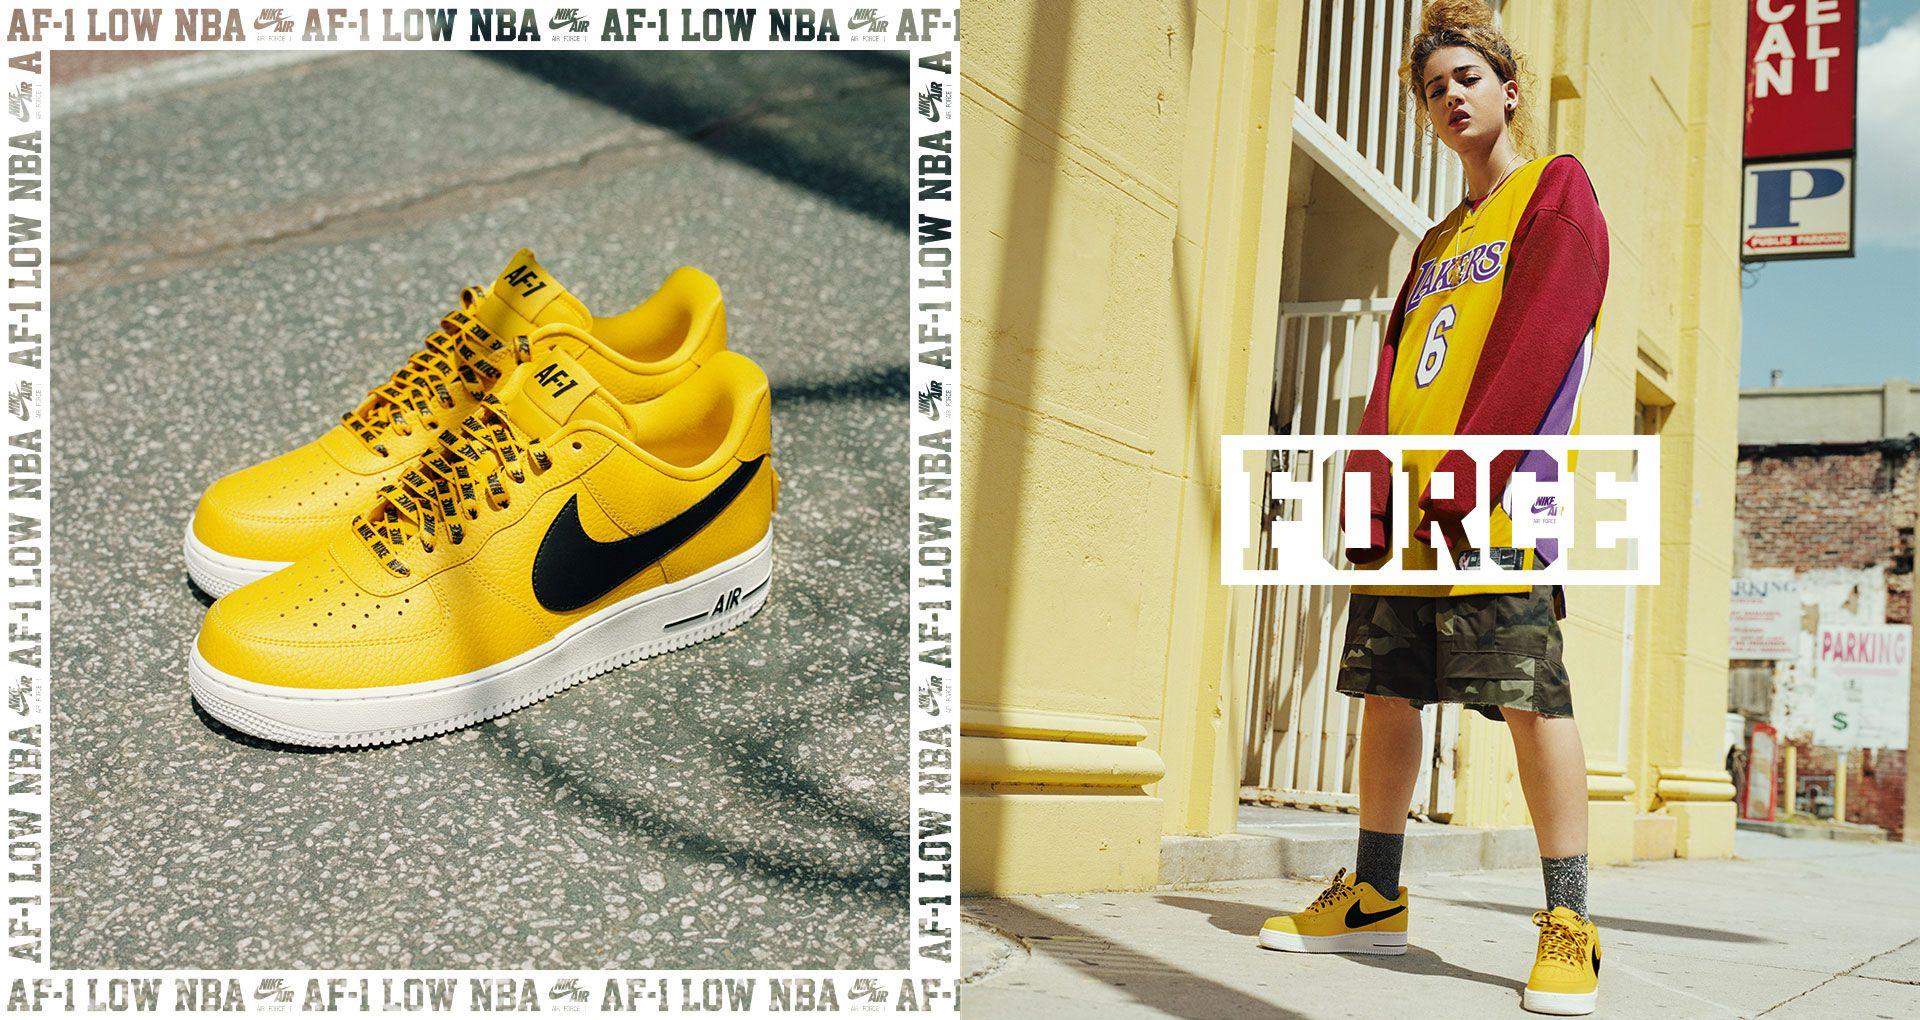 Nike Nsw Culture Of Basketball Recap 1